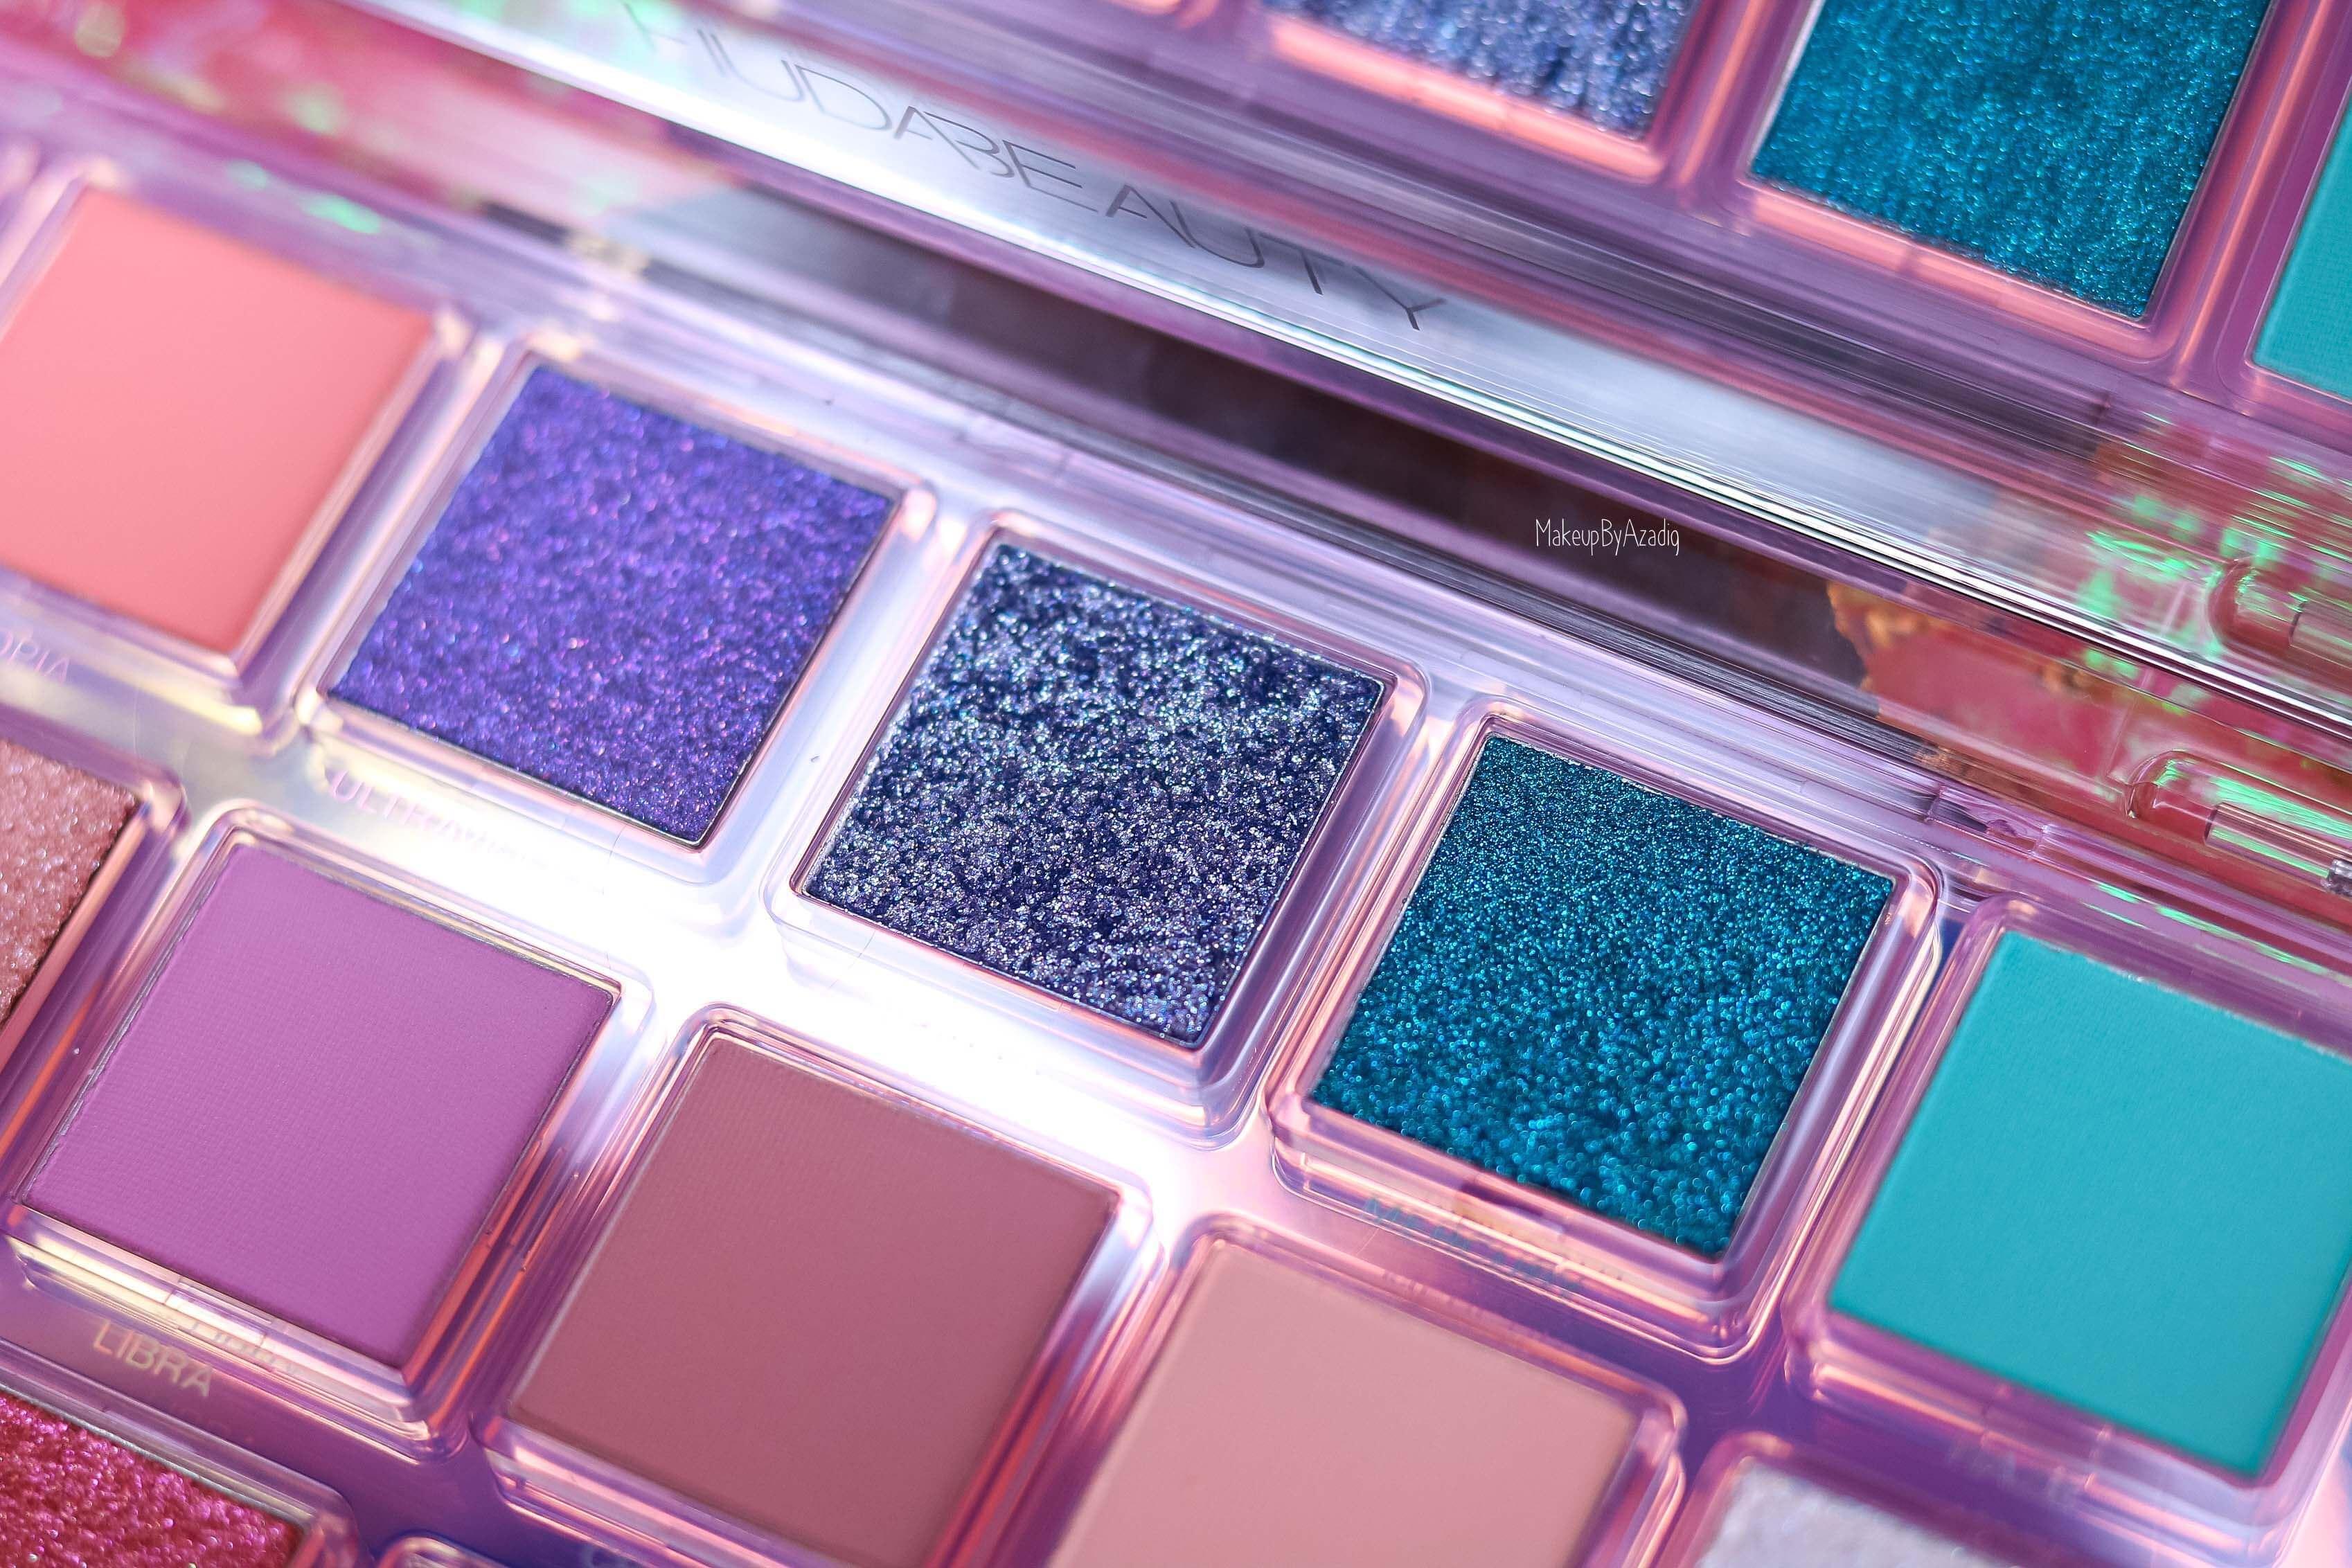 revue-palette-mercury-retrograde-huda-beauty-sephora-france-makeupbyazadig-avis-prix-swatch-astrologie-zoom-blue